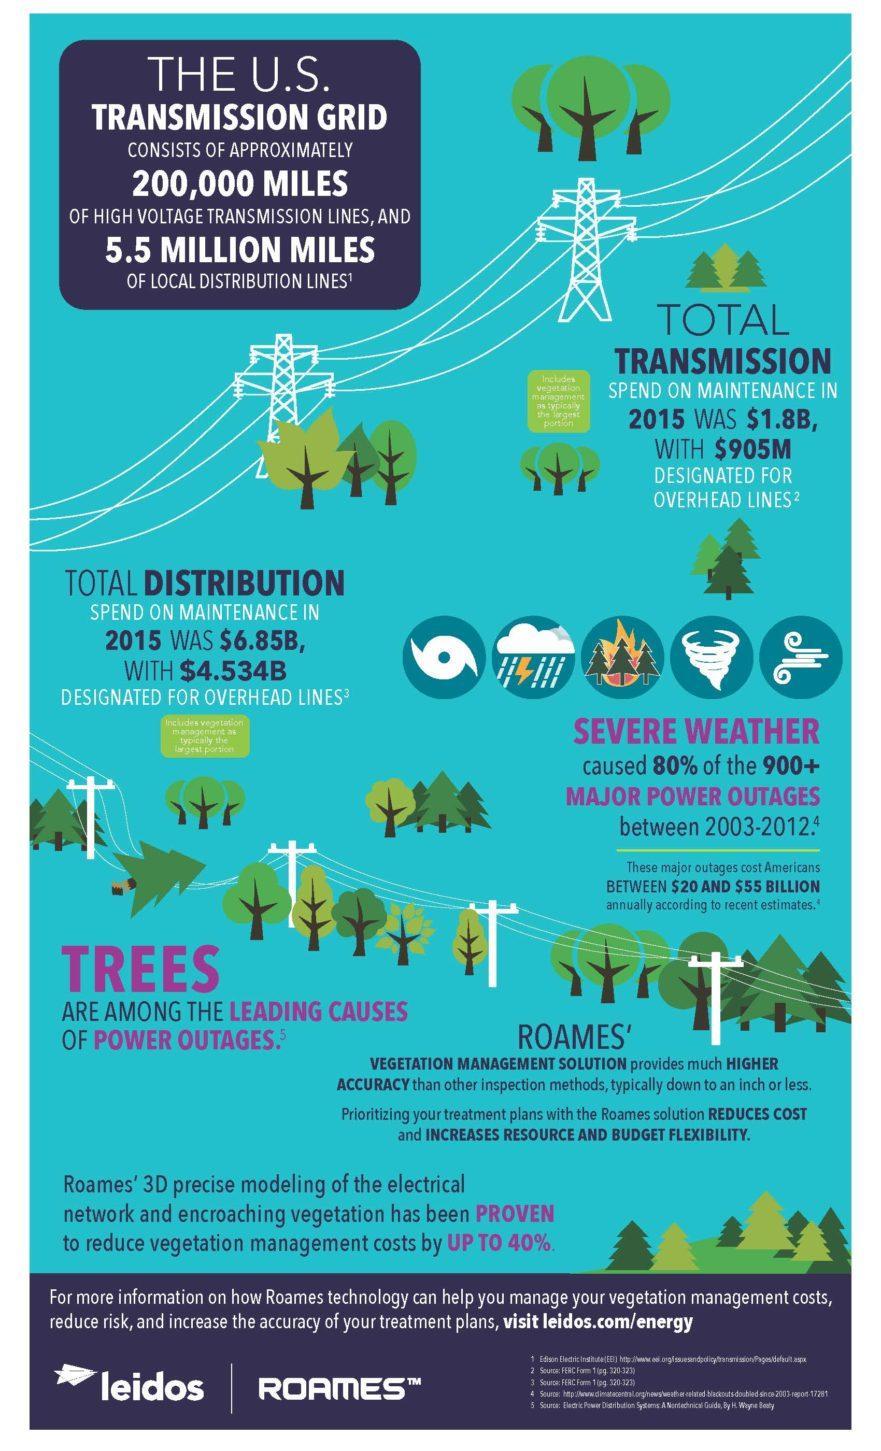 Leidos Roames infographic